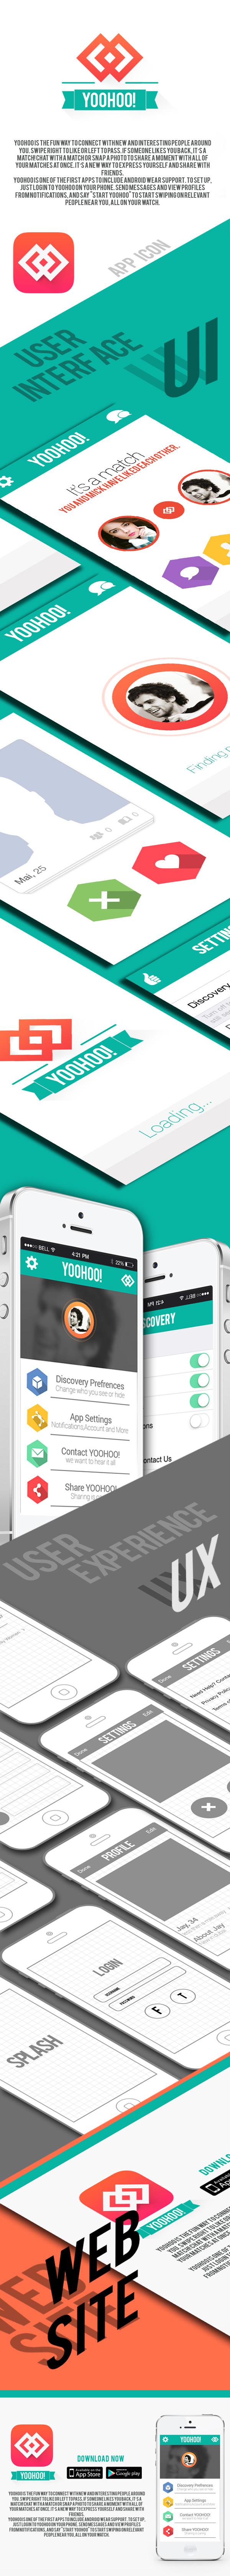 yoohoo app ui design